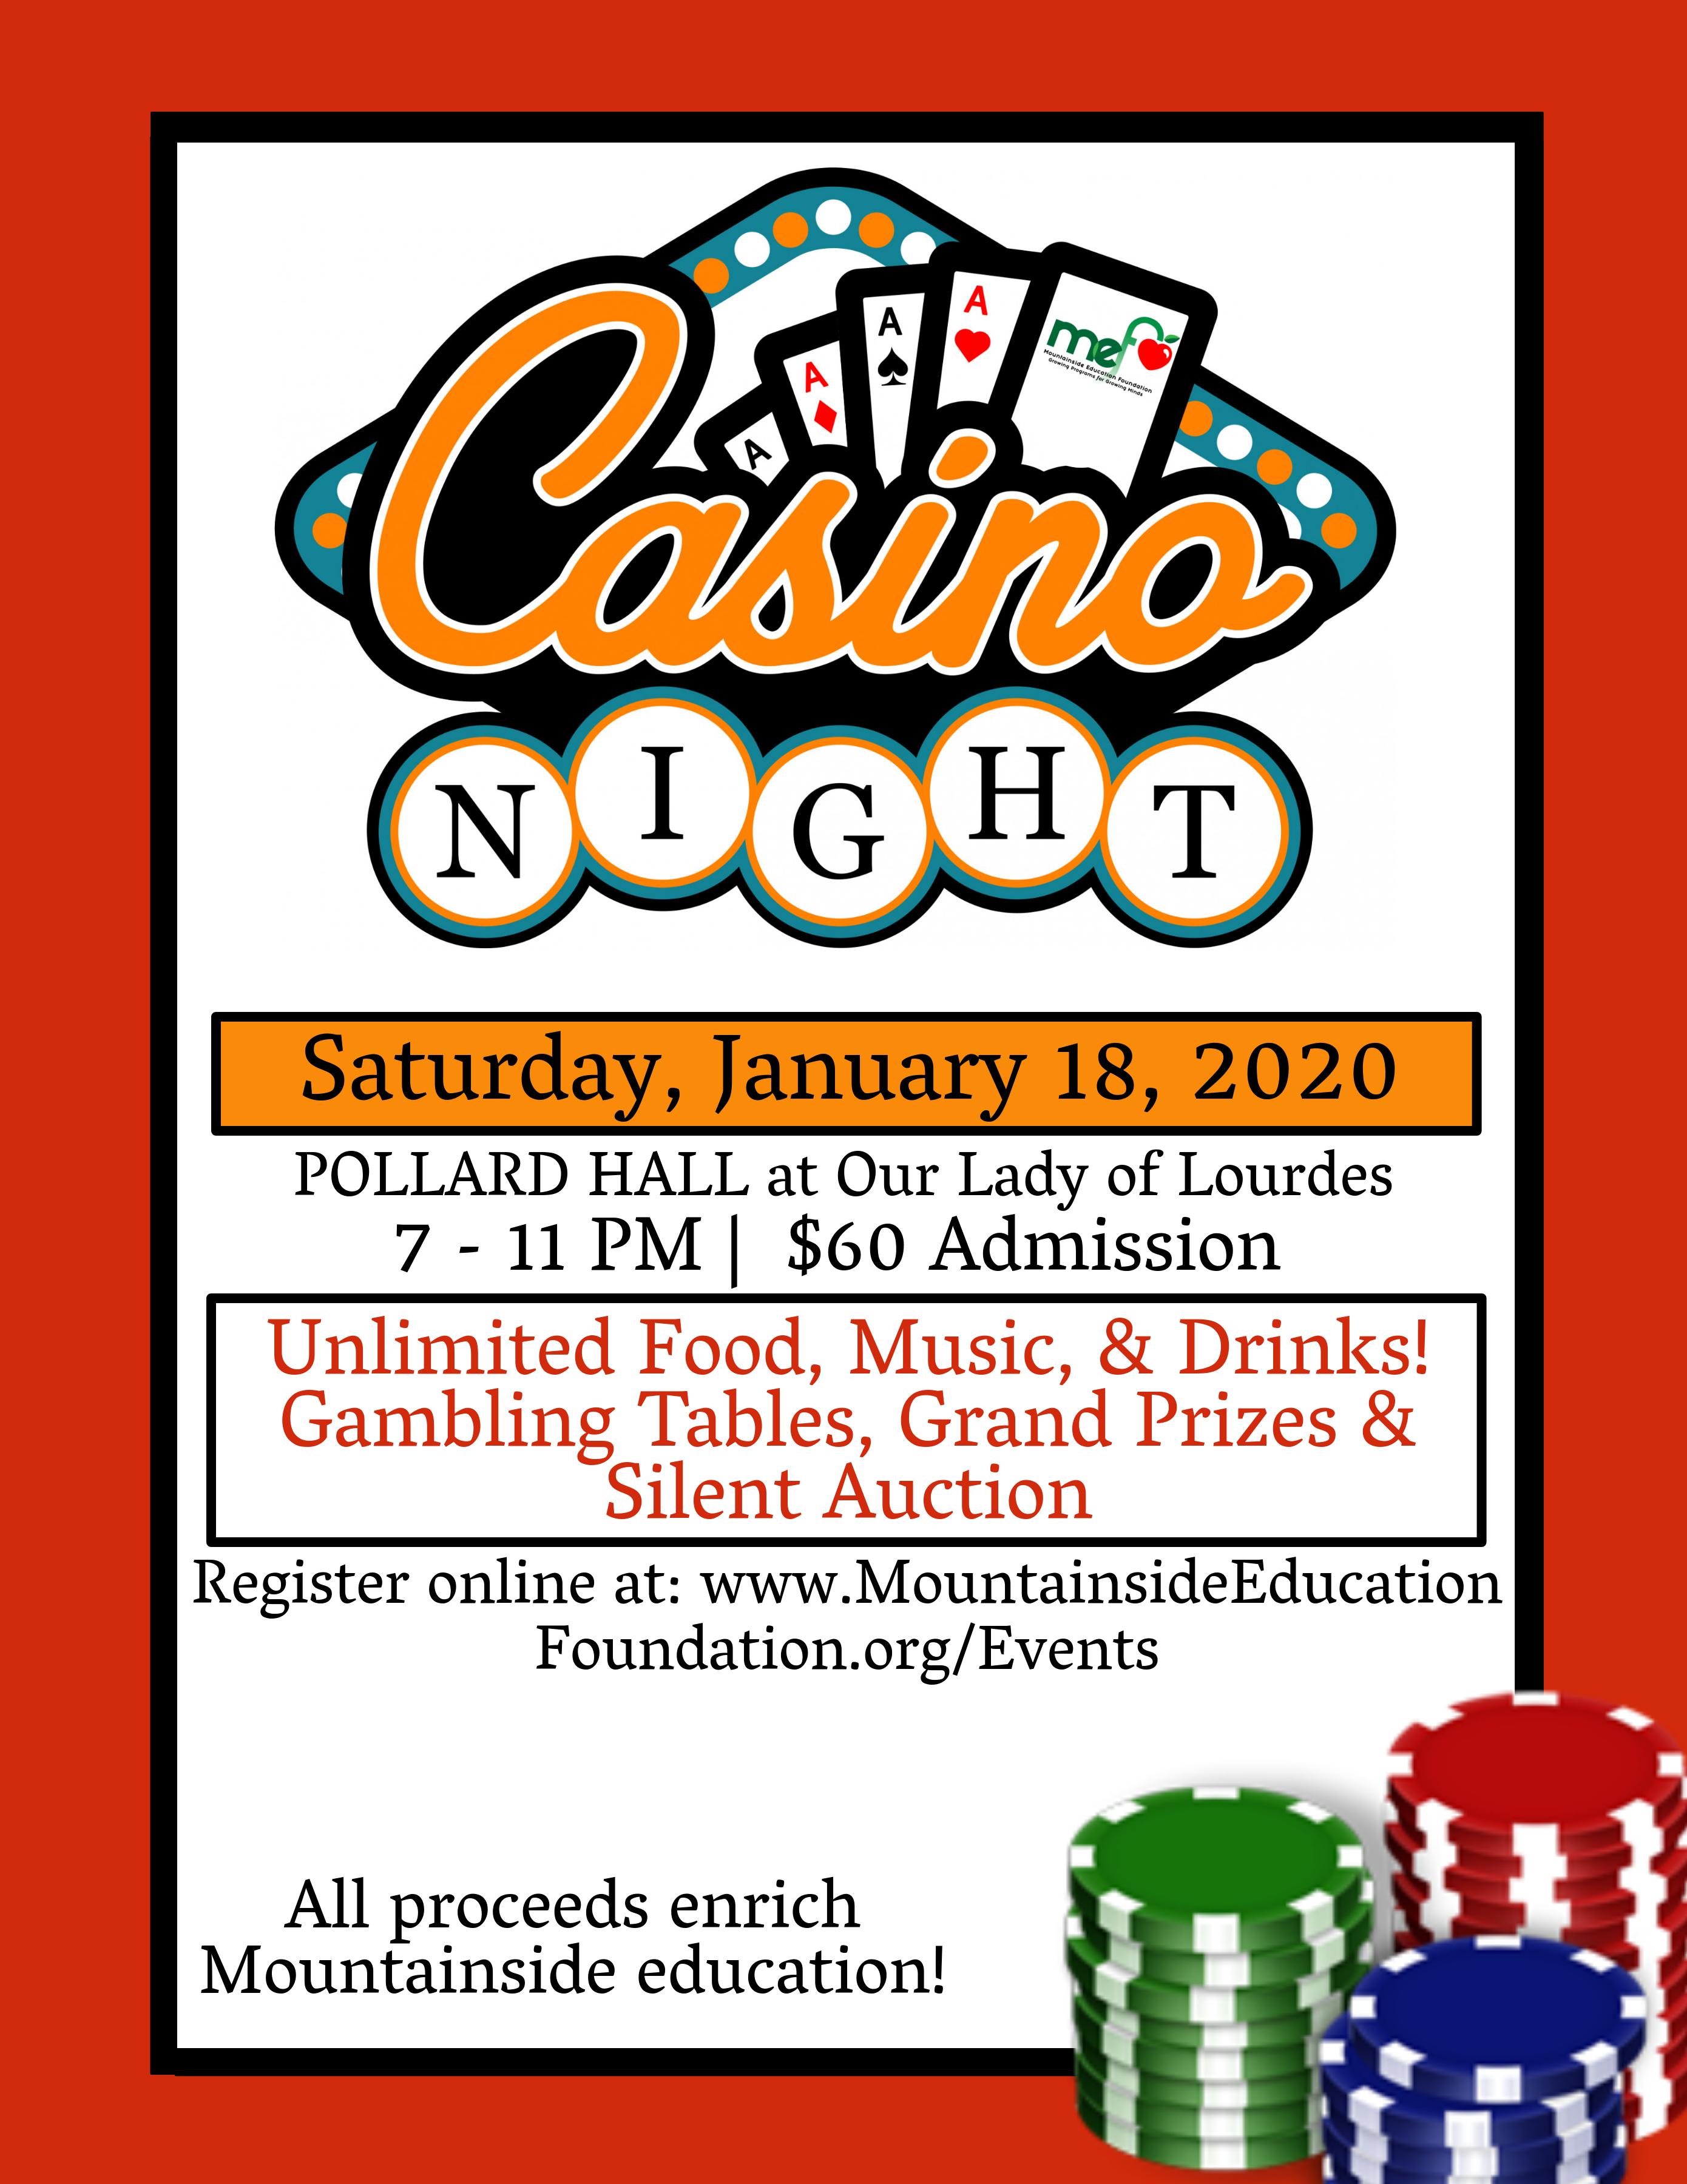 2020 Casino Night flyer